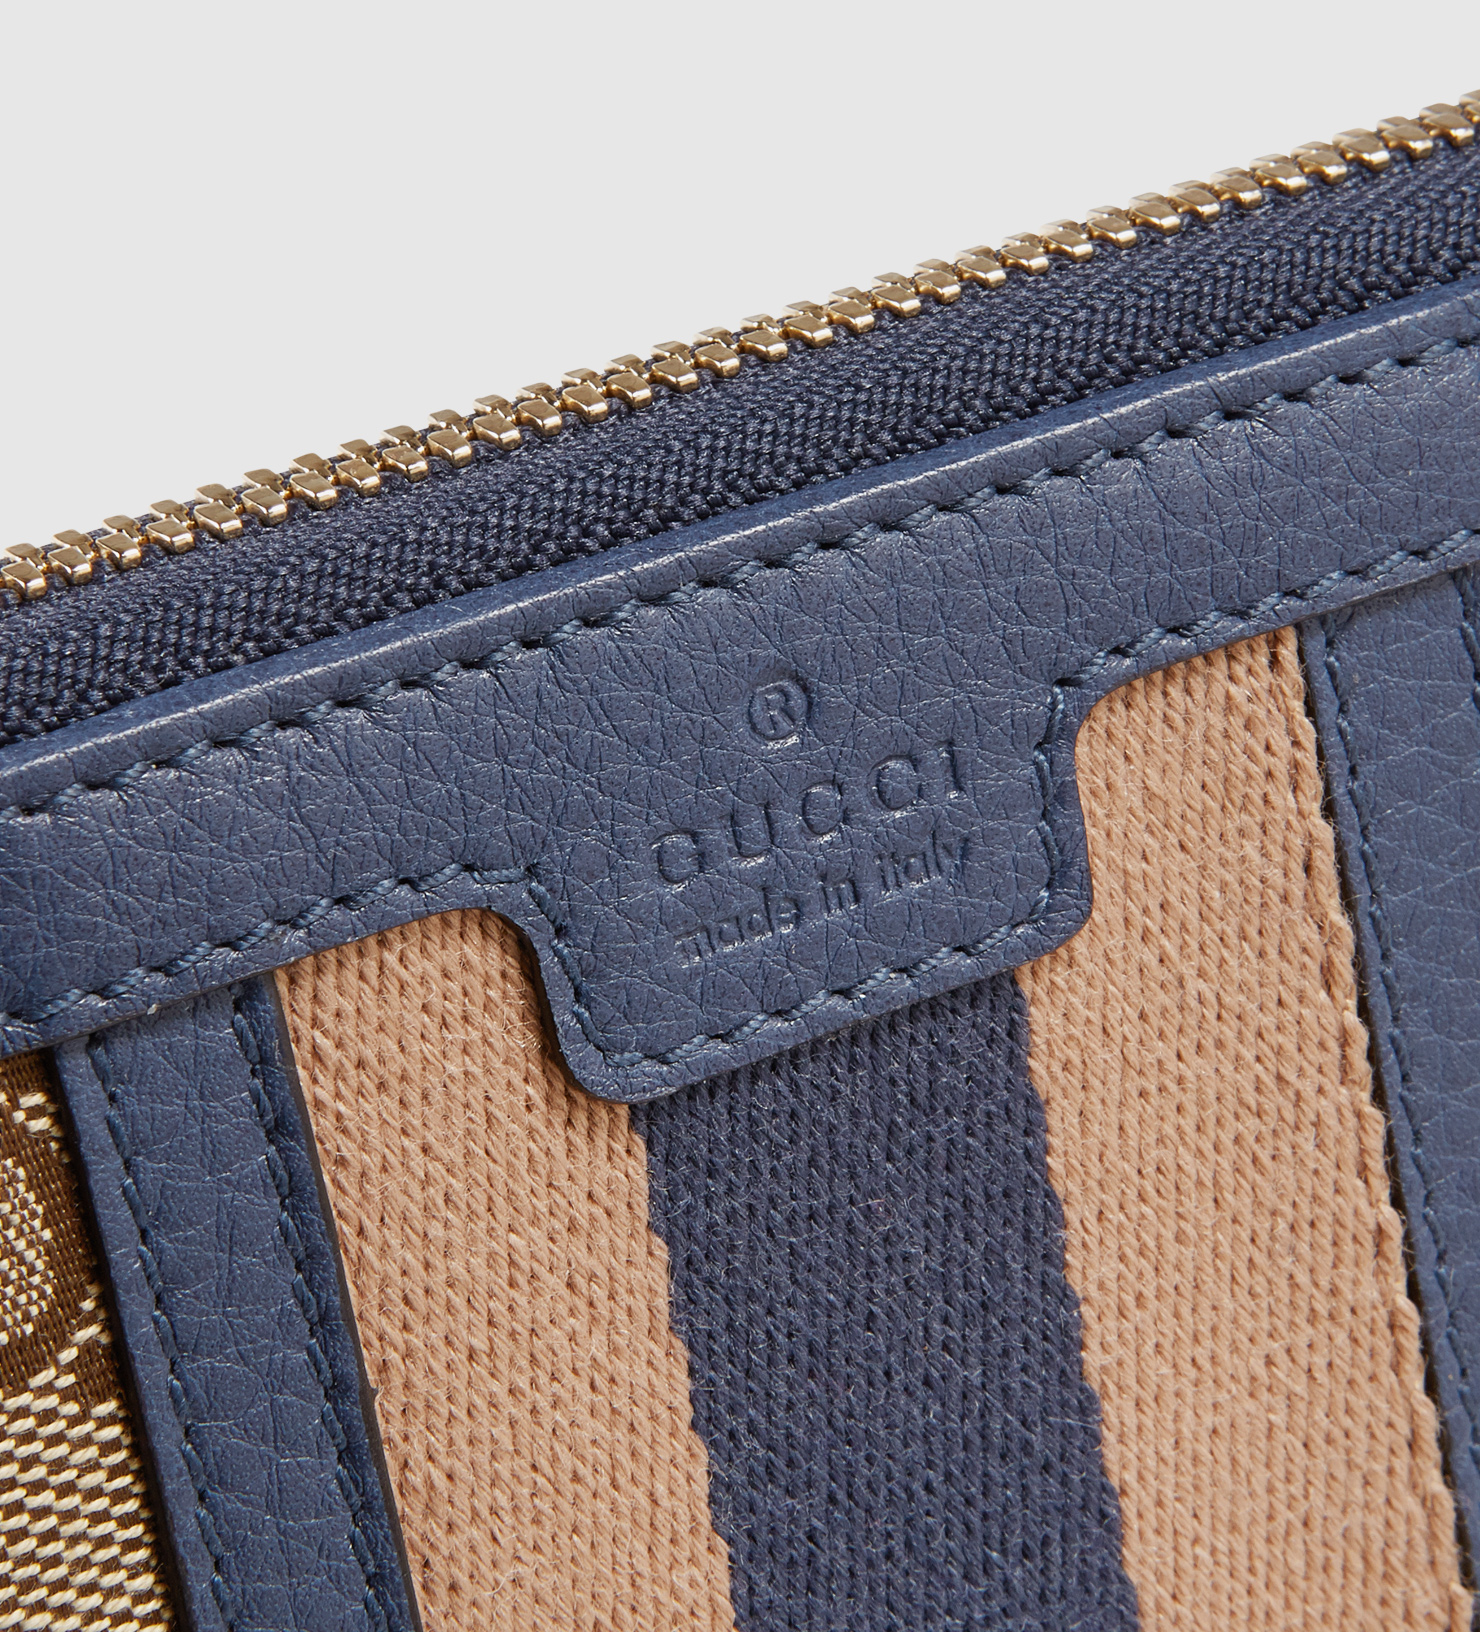 7a321f691690 Lyst - Gucci Rania Original Gg Canvas Zip Around Wallet in Blue